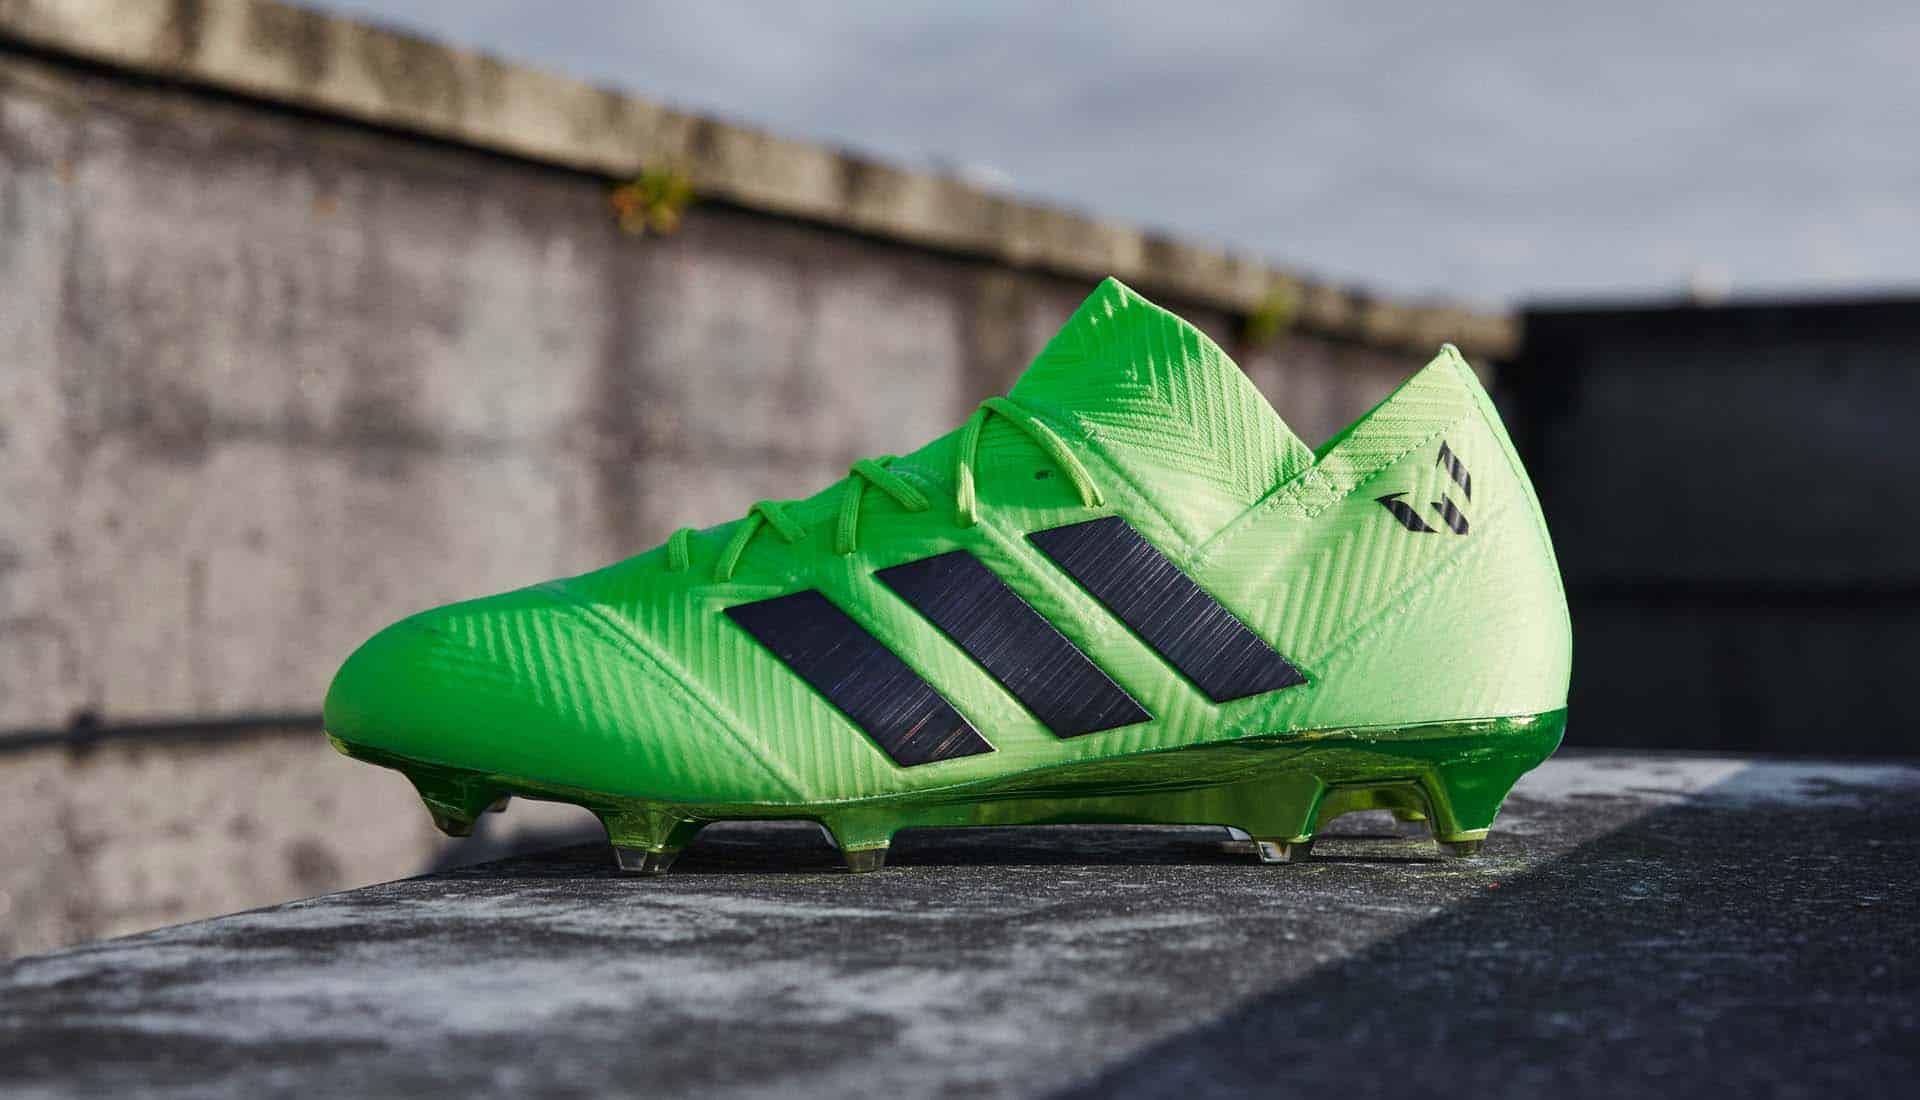 chaussures-adidas-Nemeziz-18-Messi-energy-mode-img3